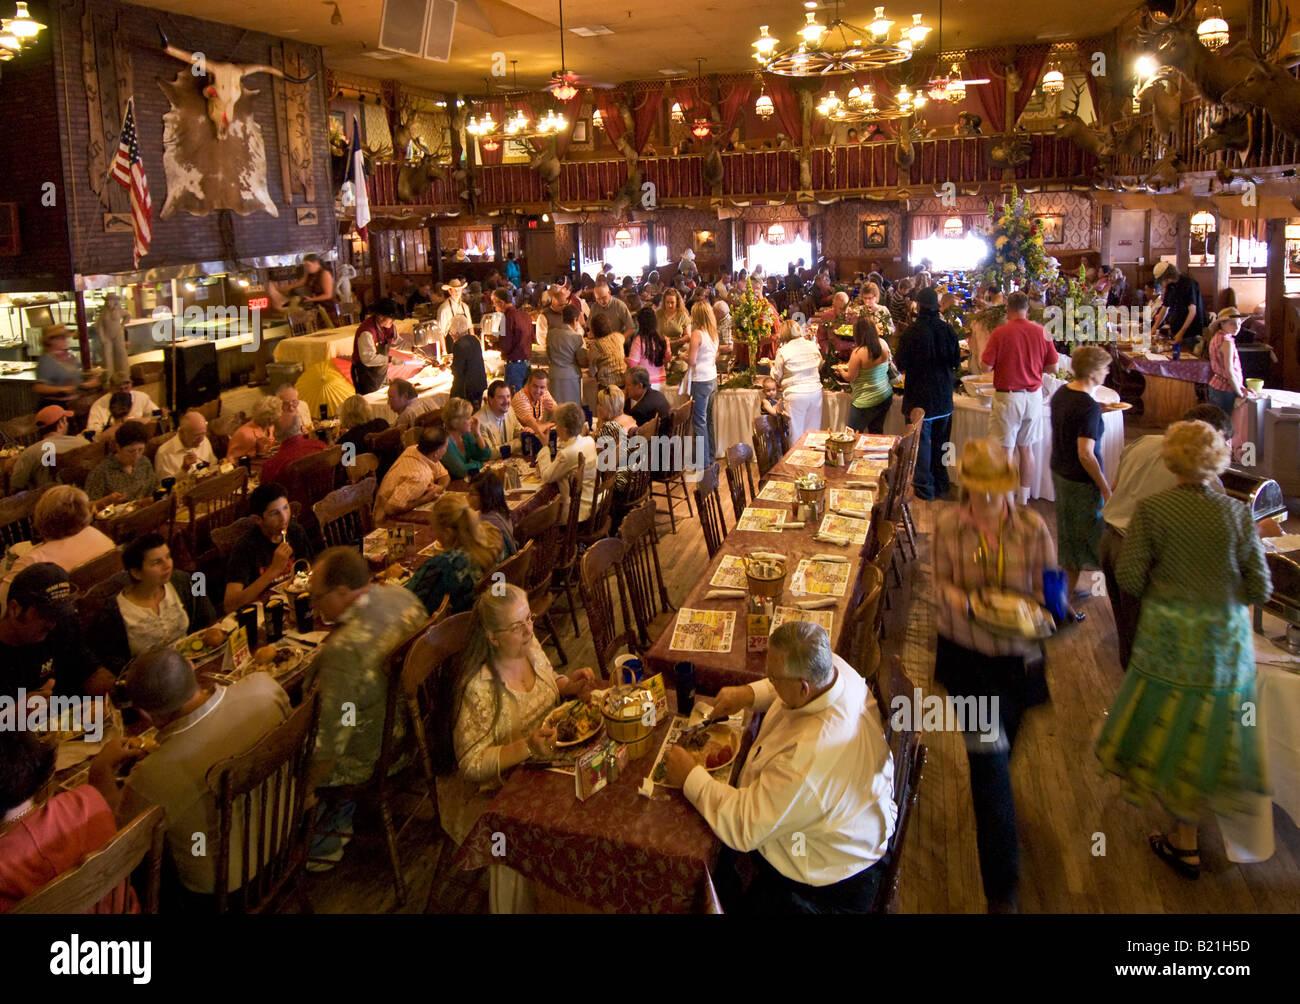 Texas Amarillo The Big Texan Steak Ranch restaurant interior dining room - Stock Image